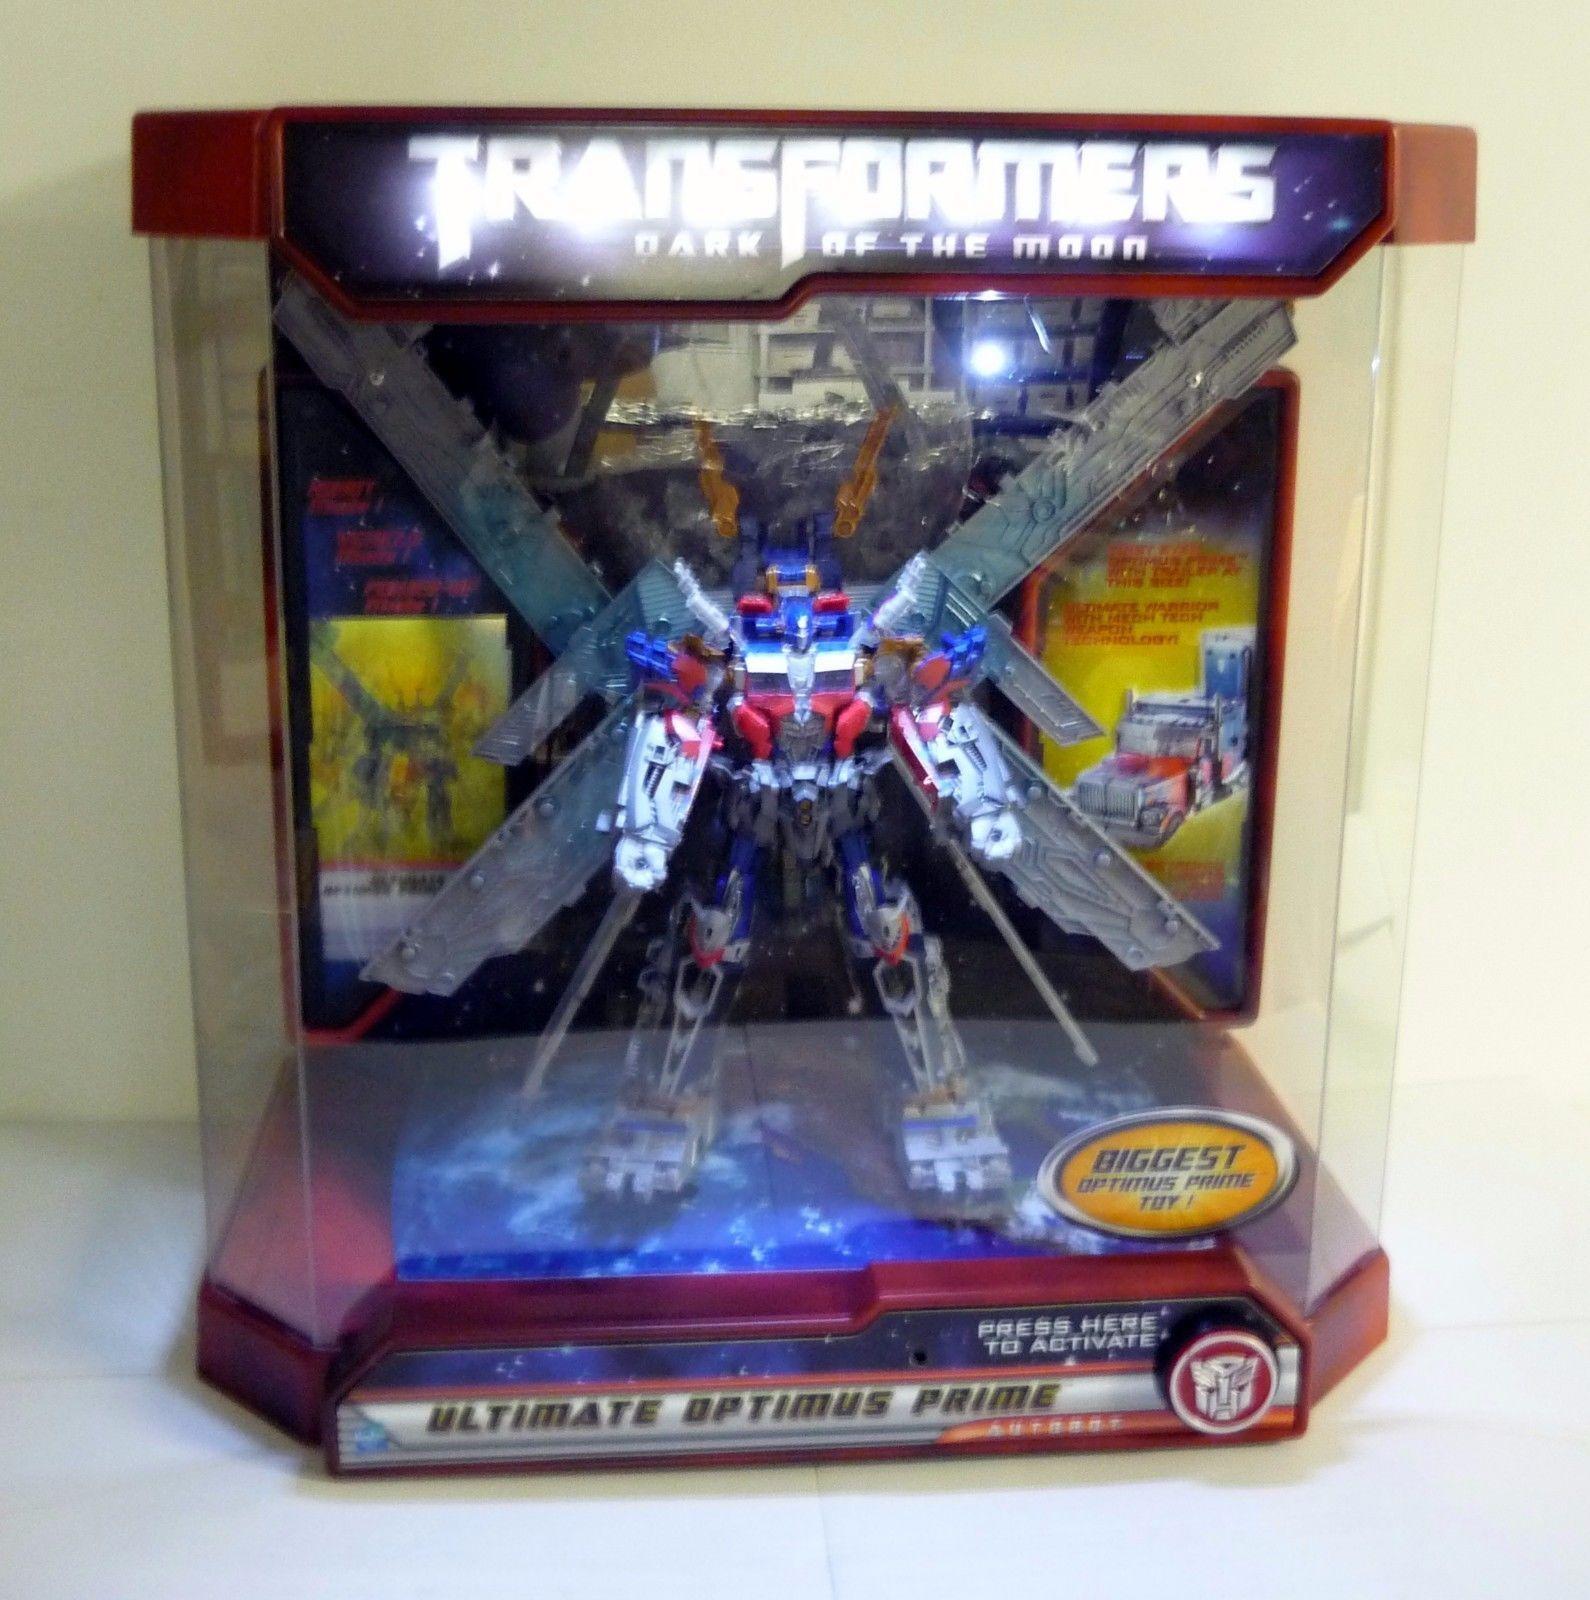 Transformers Optimus Prime Store Display Case Ultimate 24  Dotm completa 2011